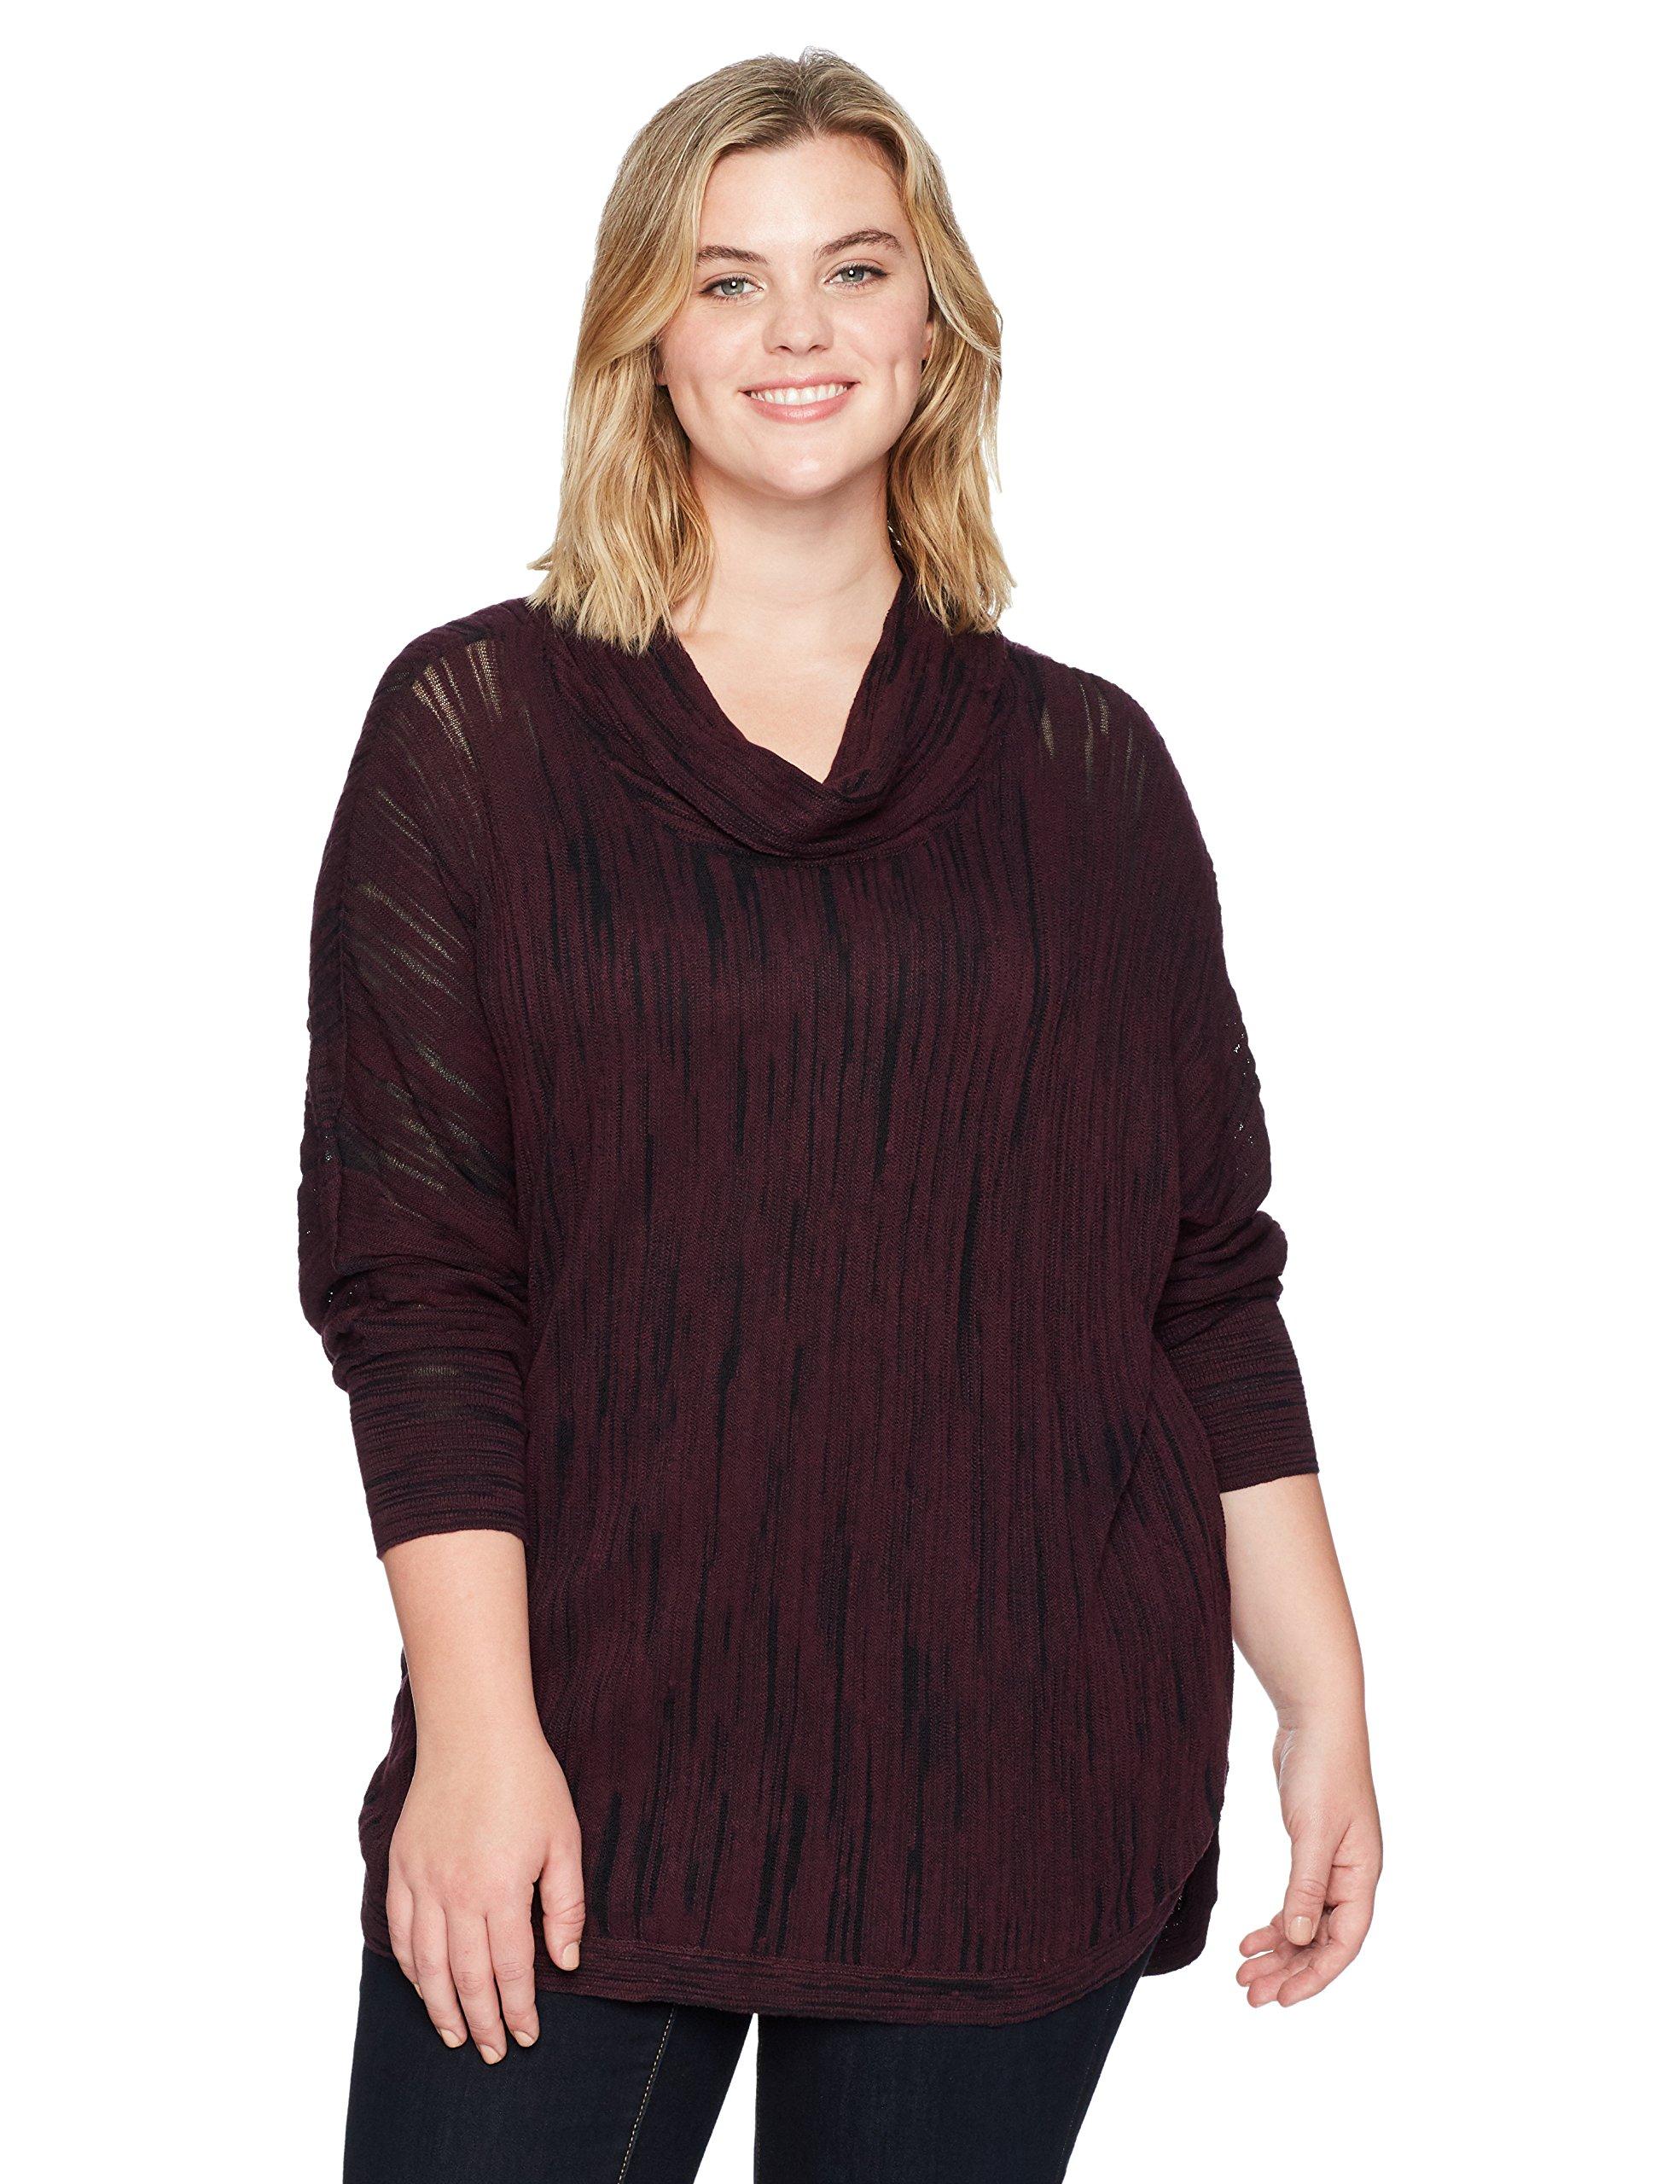 NIC+ZOE Women's Plus Size Cowled Knit Top, Wine, 2X